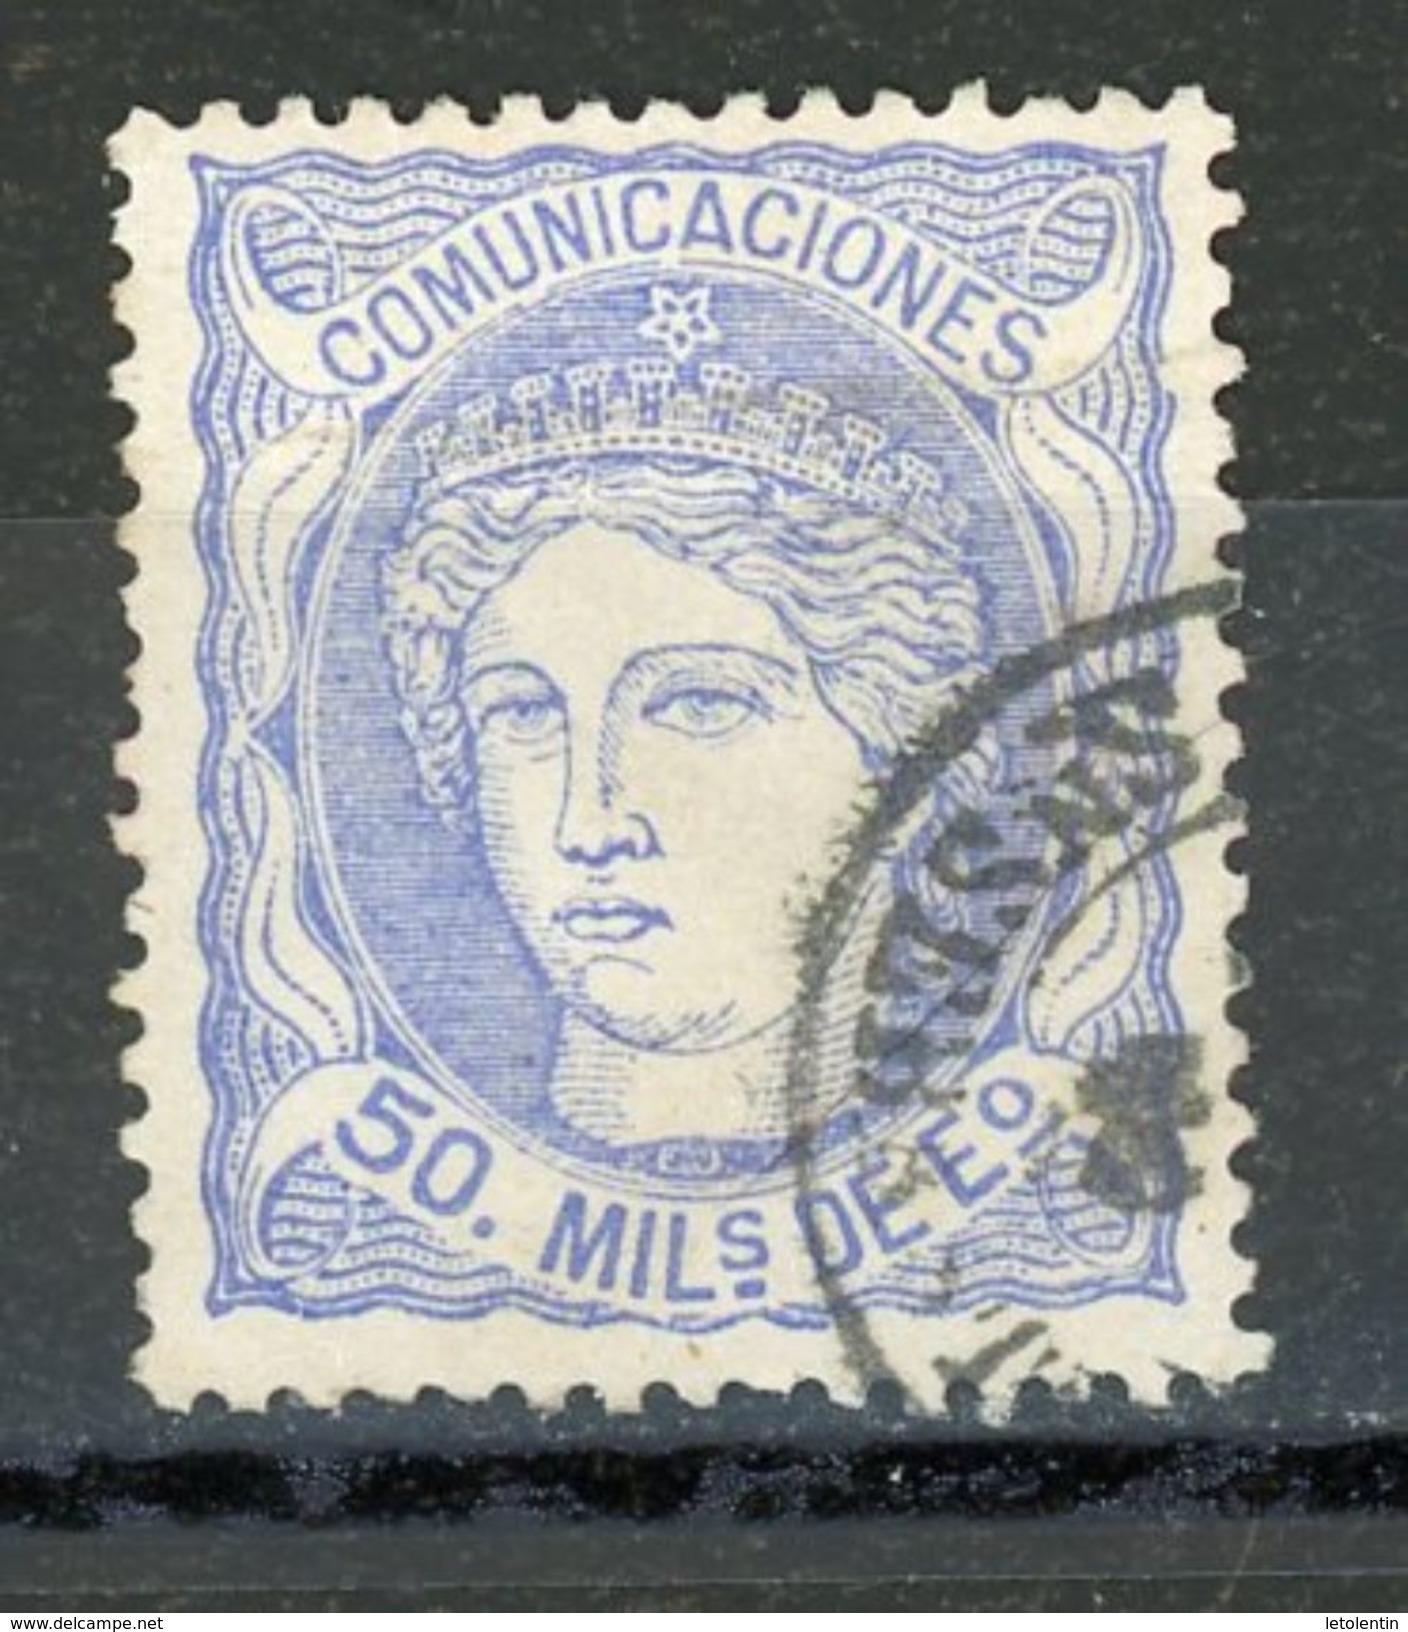 ESPAGNE : SOUVERAINS - N° Yvert 107 Obli. - 1870-72 Regency